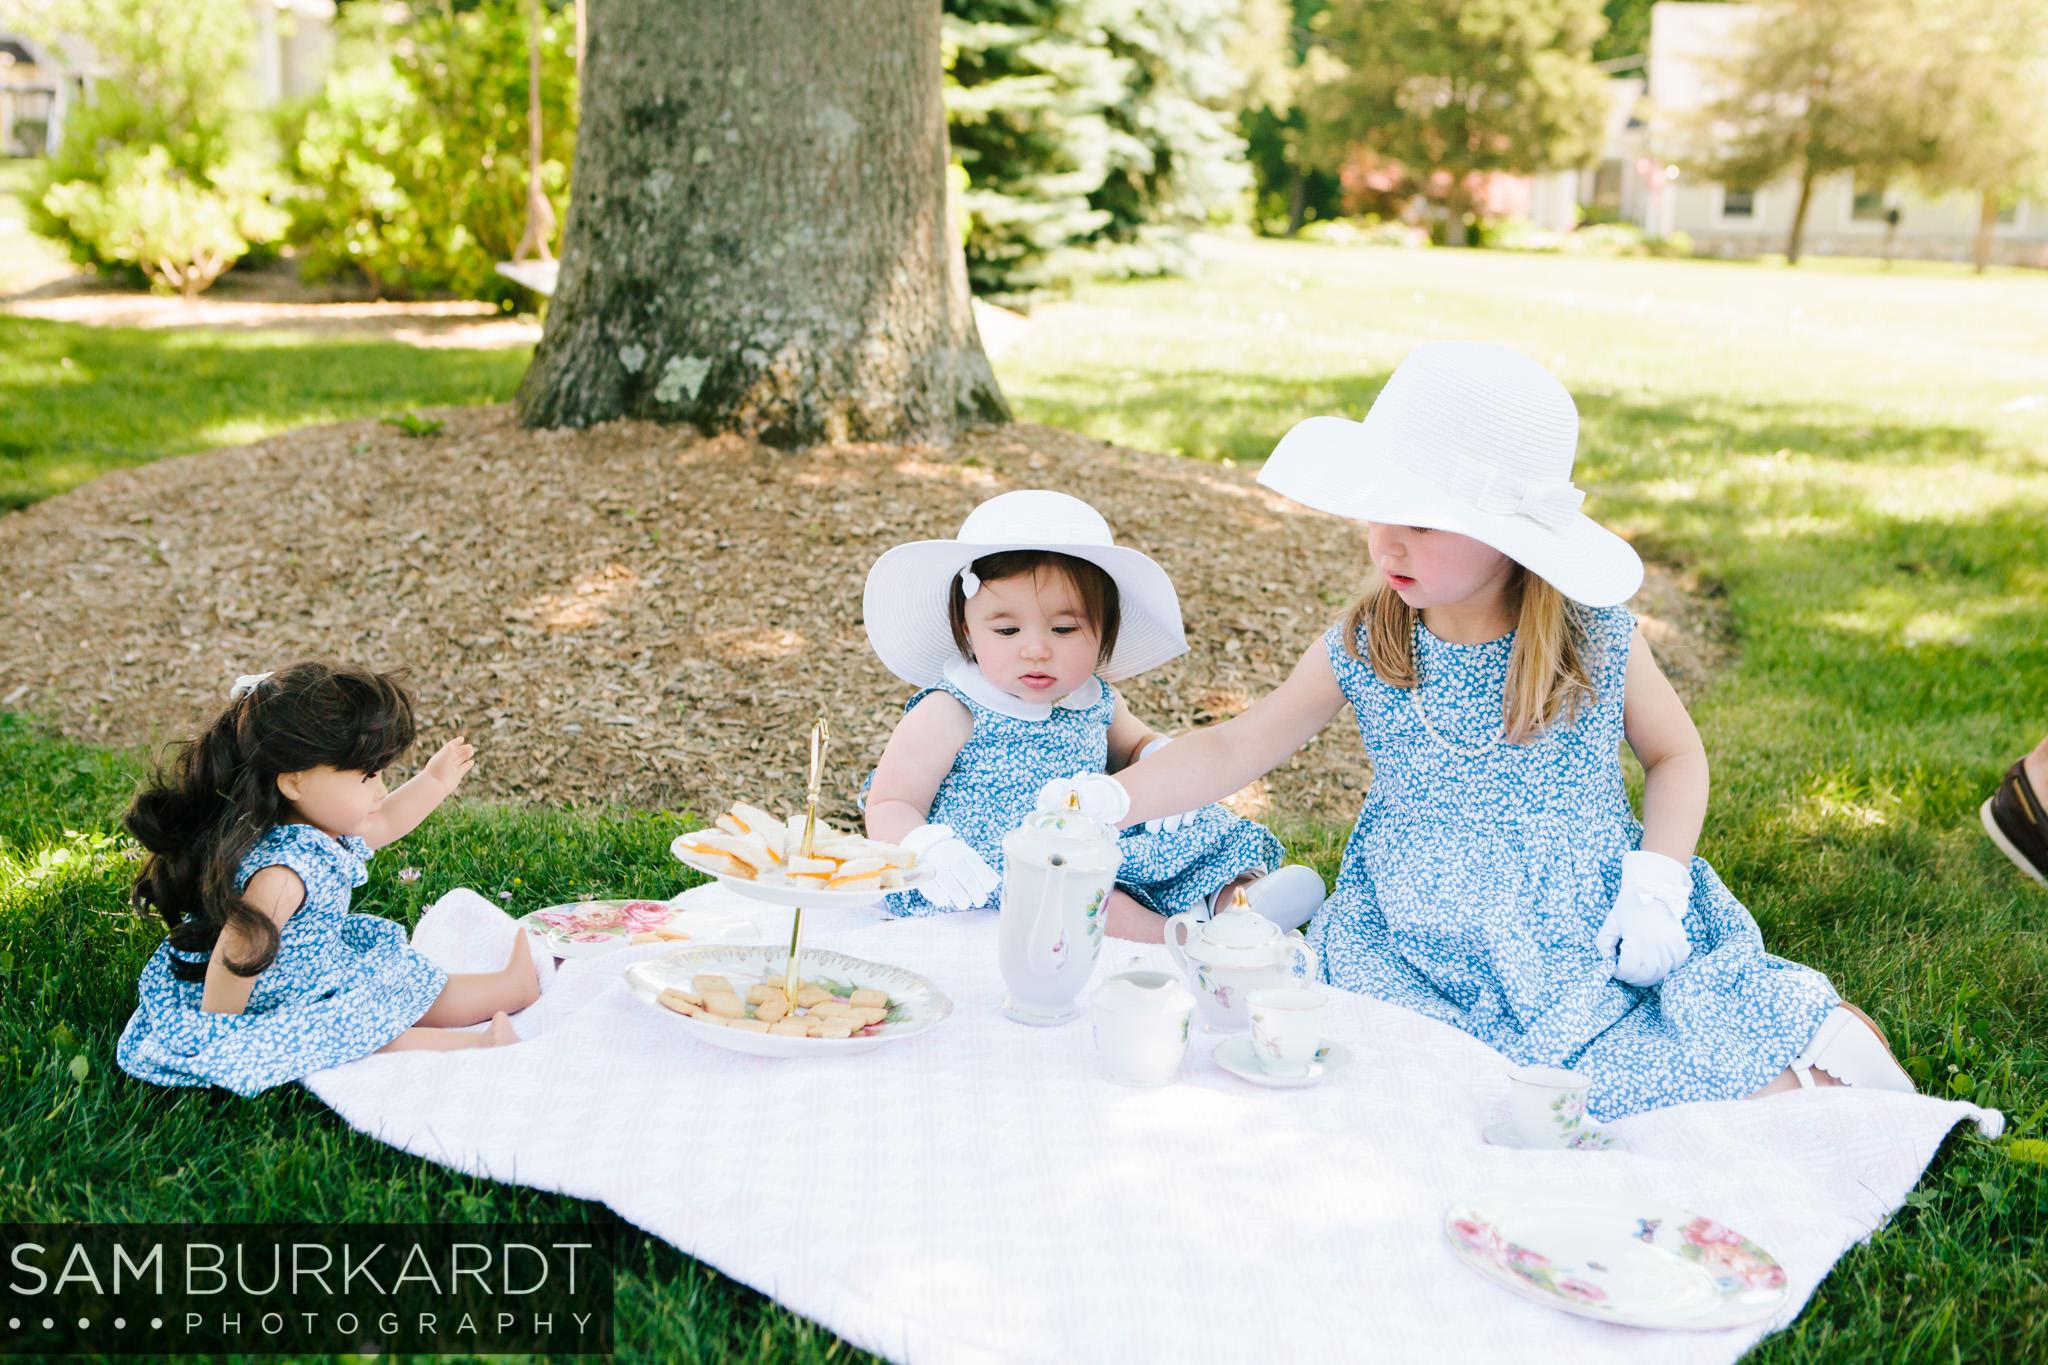 sburkardt_family_portraits_photoshoot_ridgefield_connecticut_summer_tea_party_004.jpg